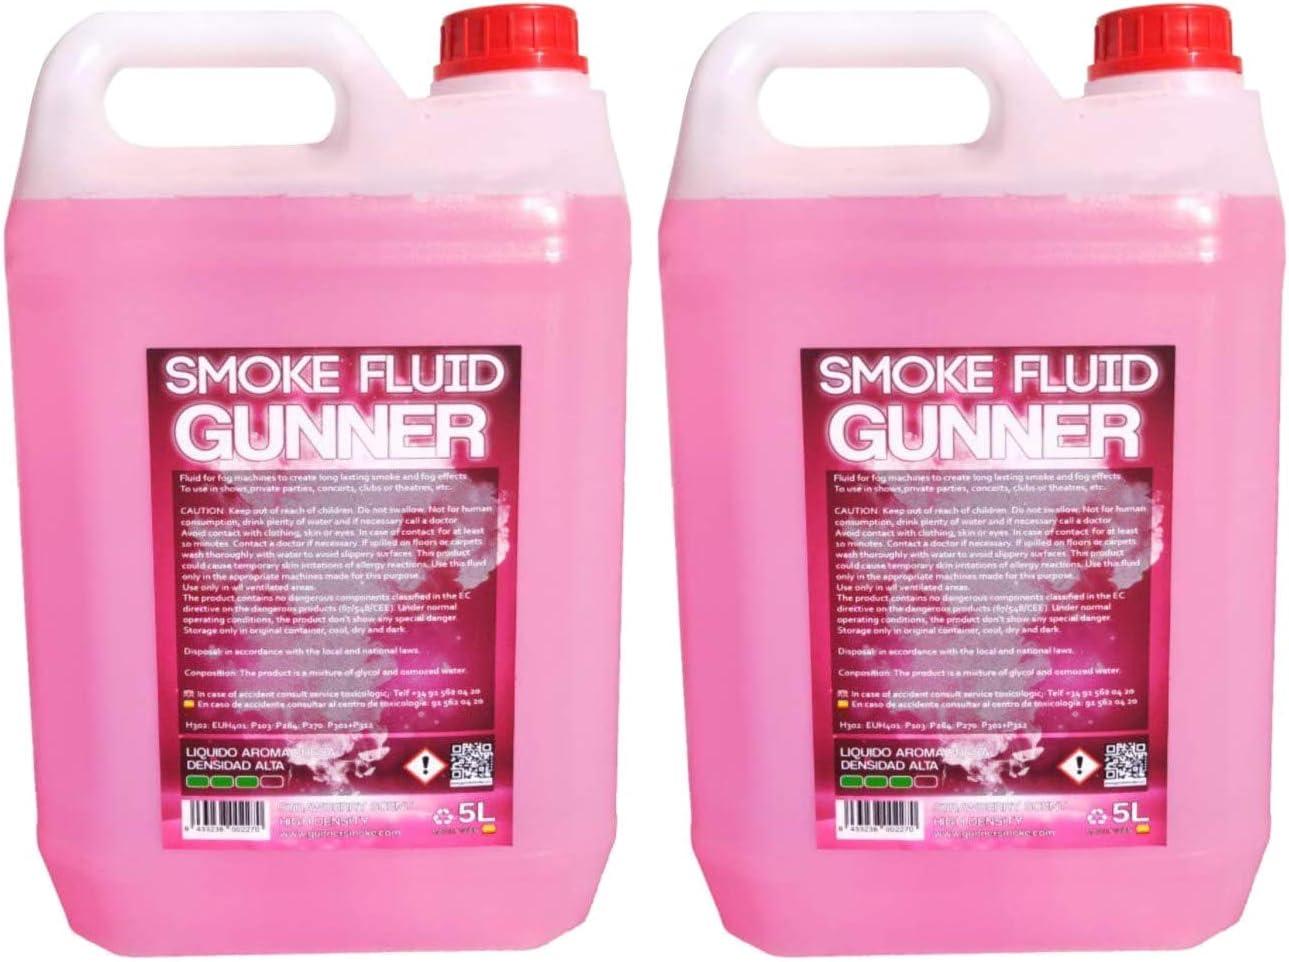 Liquido de humo Pack 2 x de ALTA DENSIDAD olor FRESA 5L Liquido de niebla,Humo Gunner Smoke